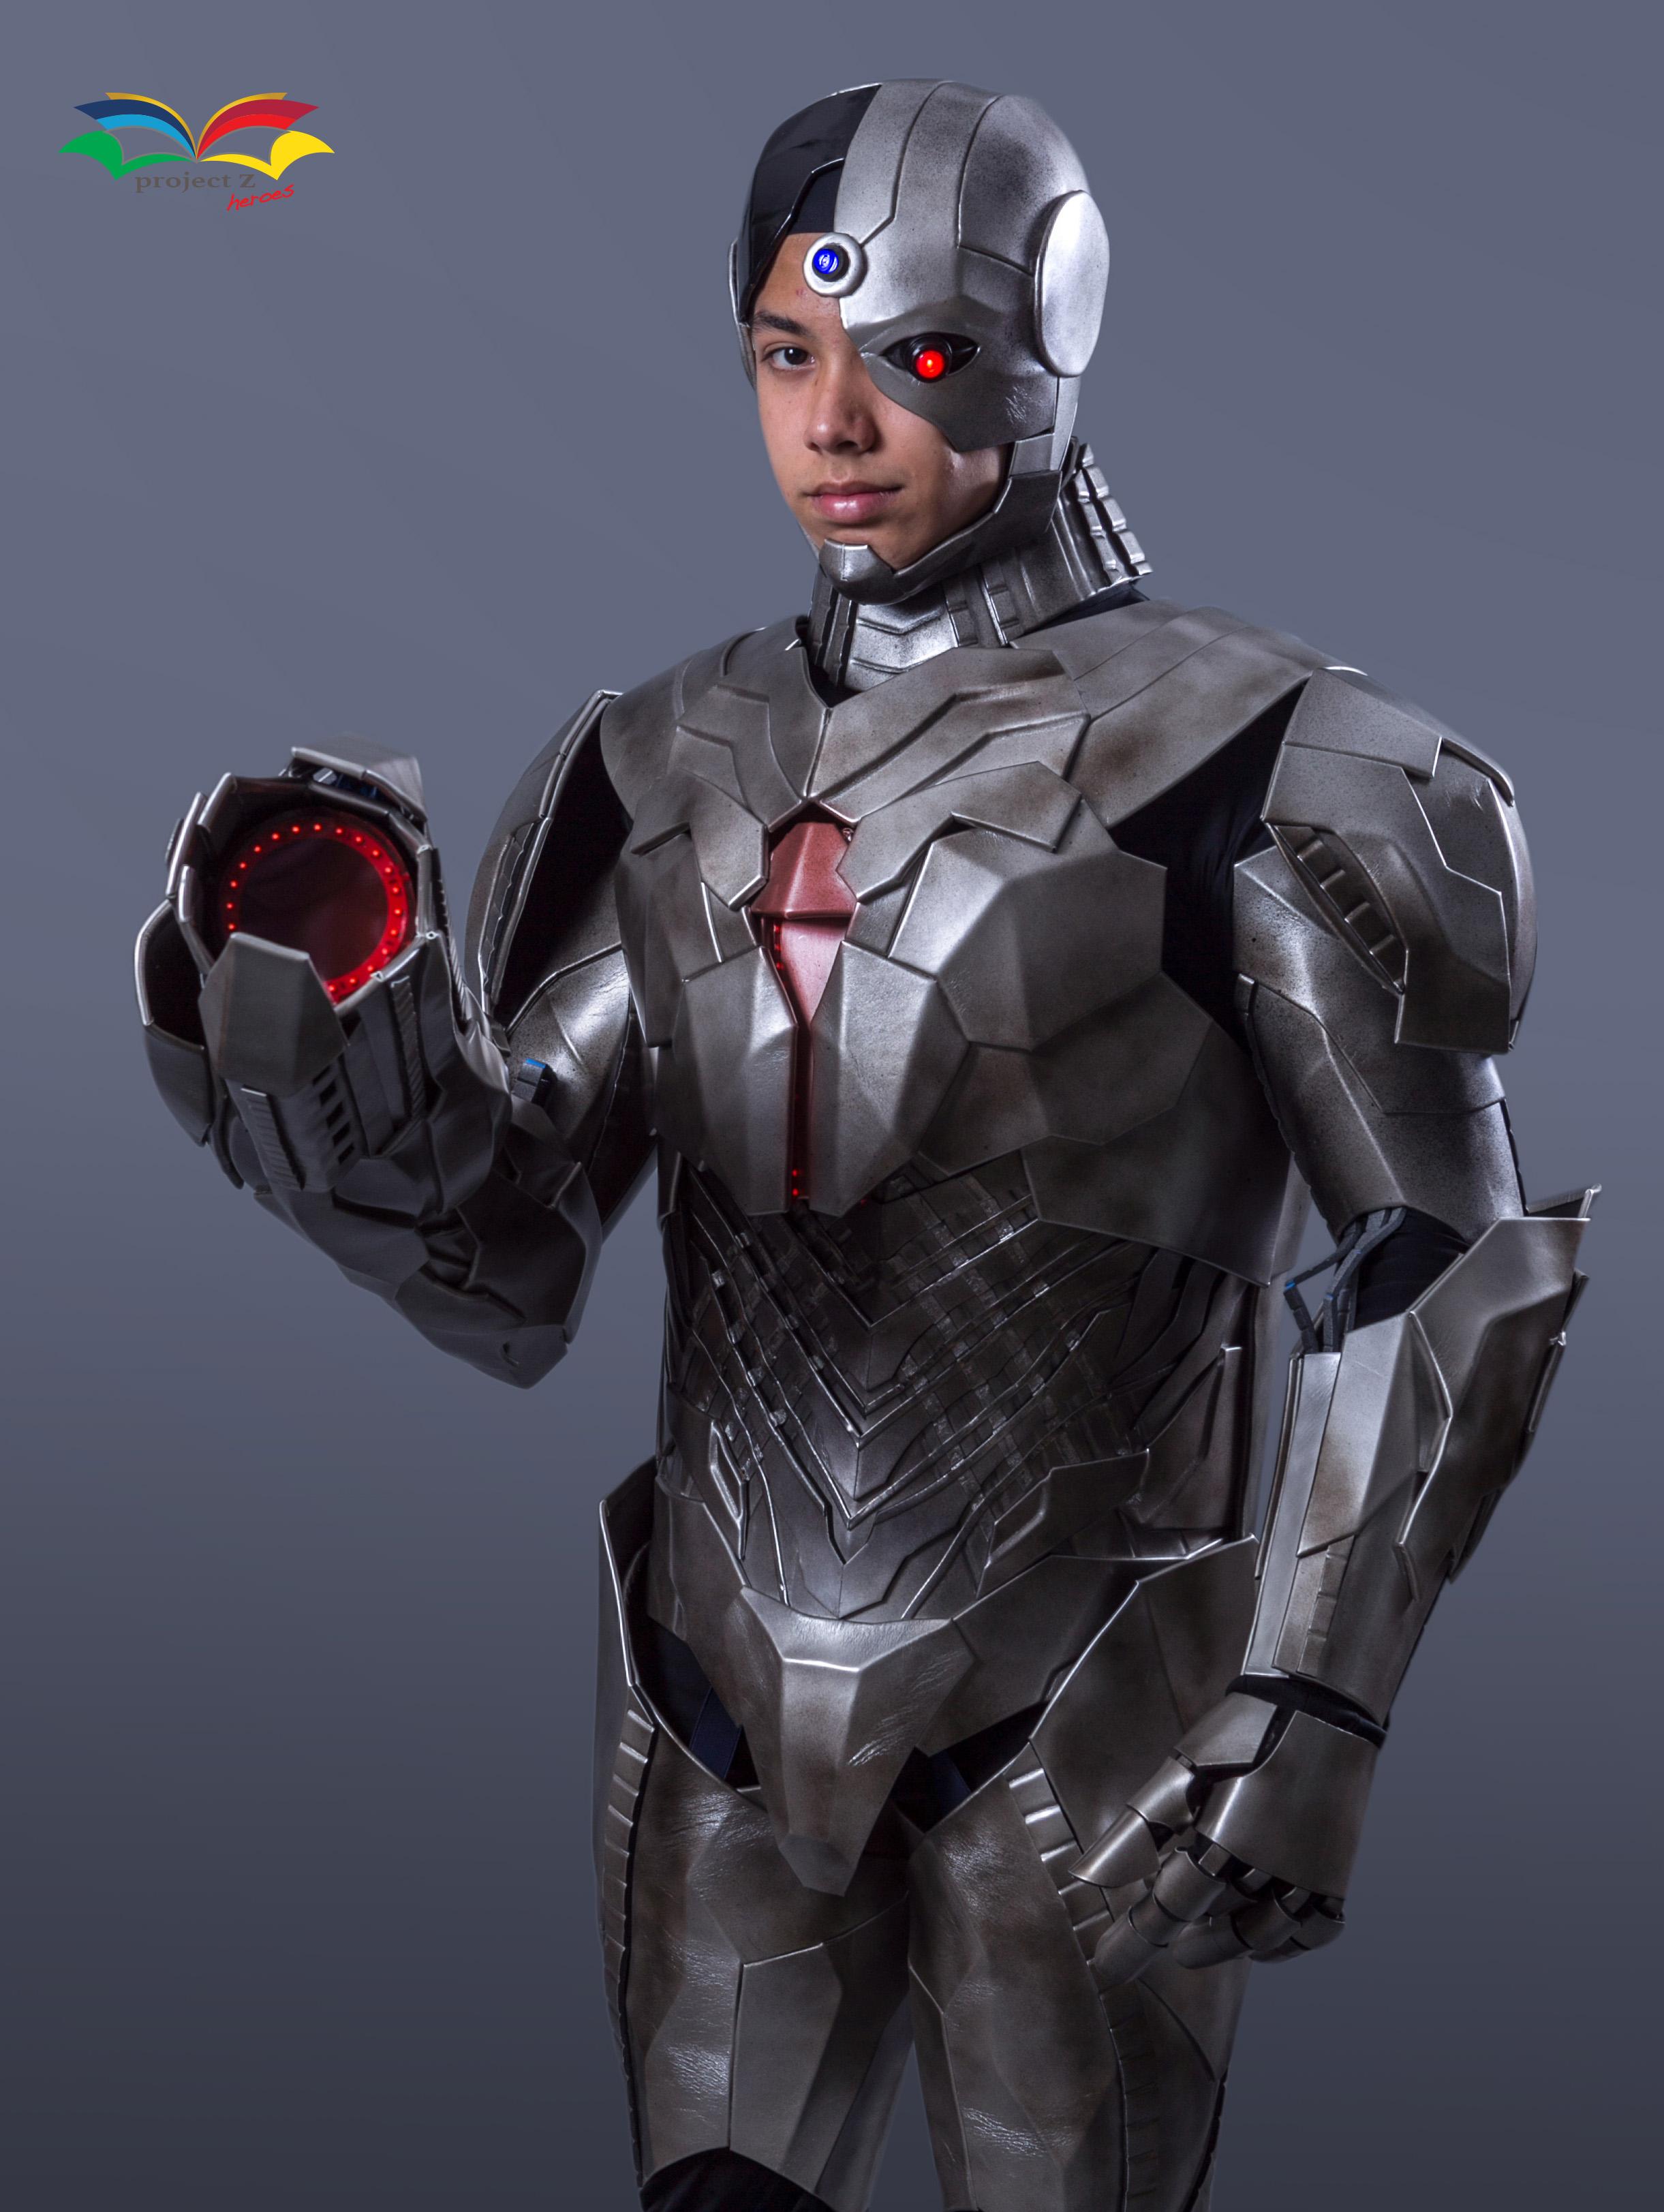 Cyborg costume closeup with gun